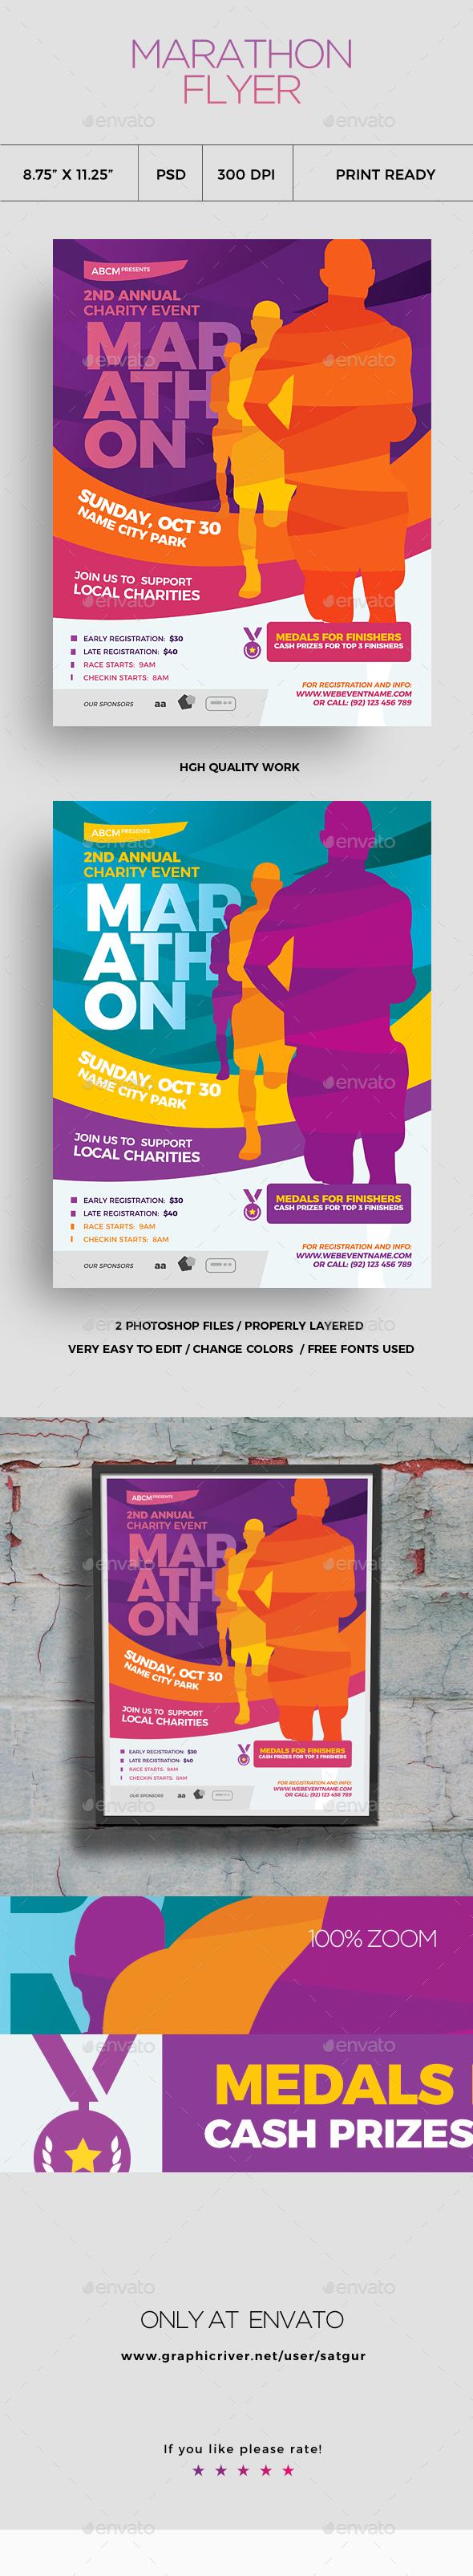 Marathon Flyer Vol1 - Sports Events